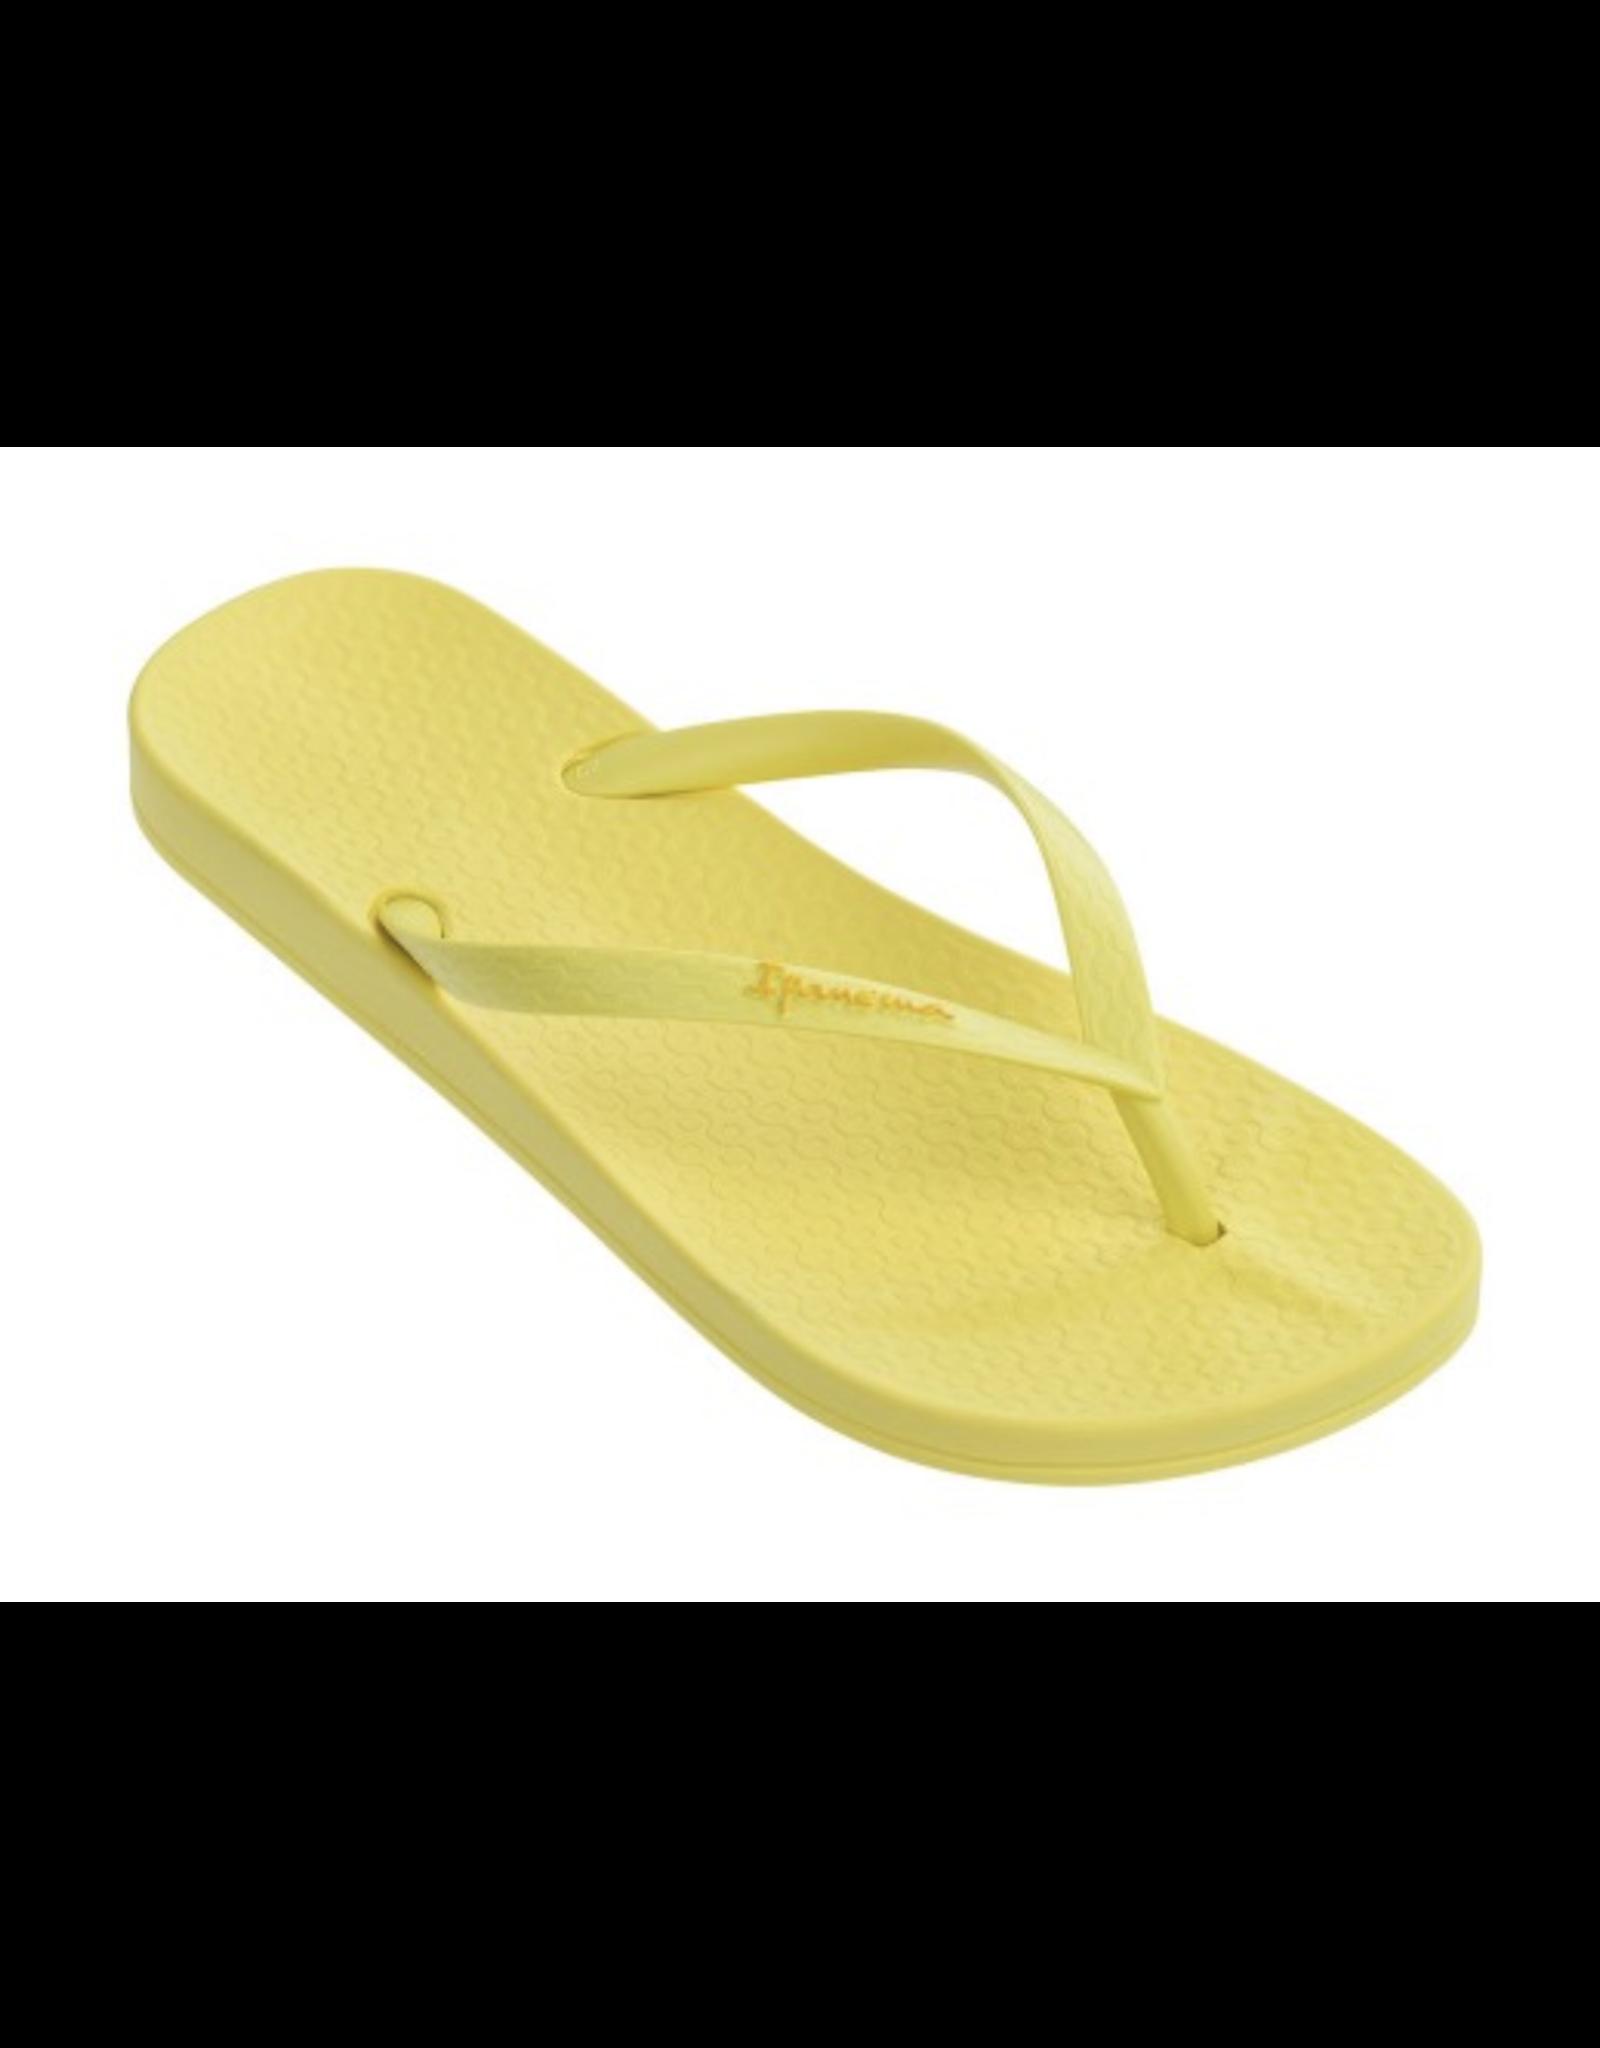 Ipanema Ana Tan Flip Flop